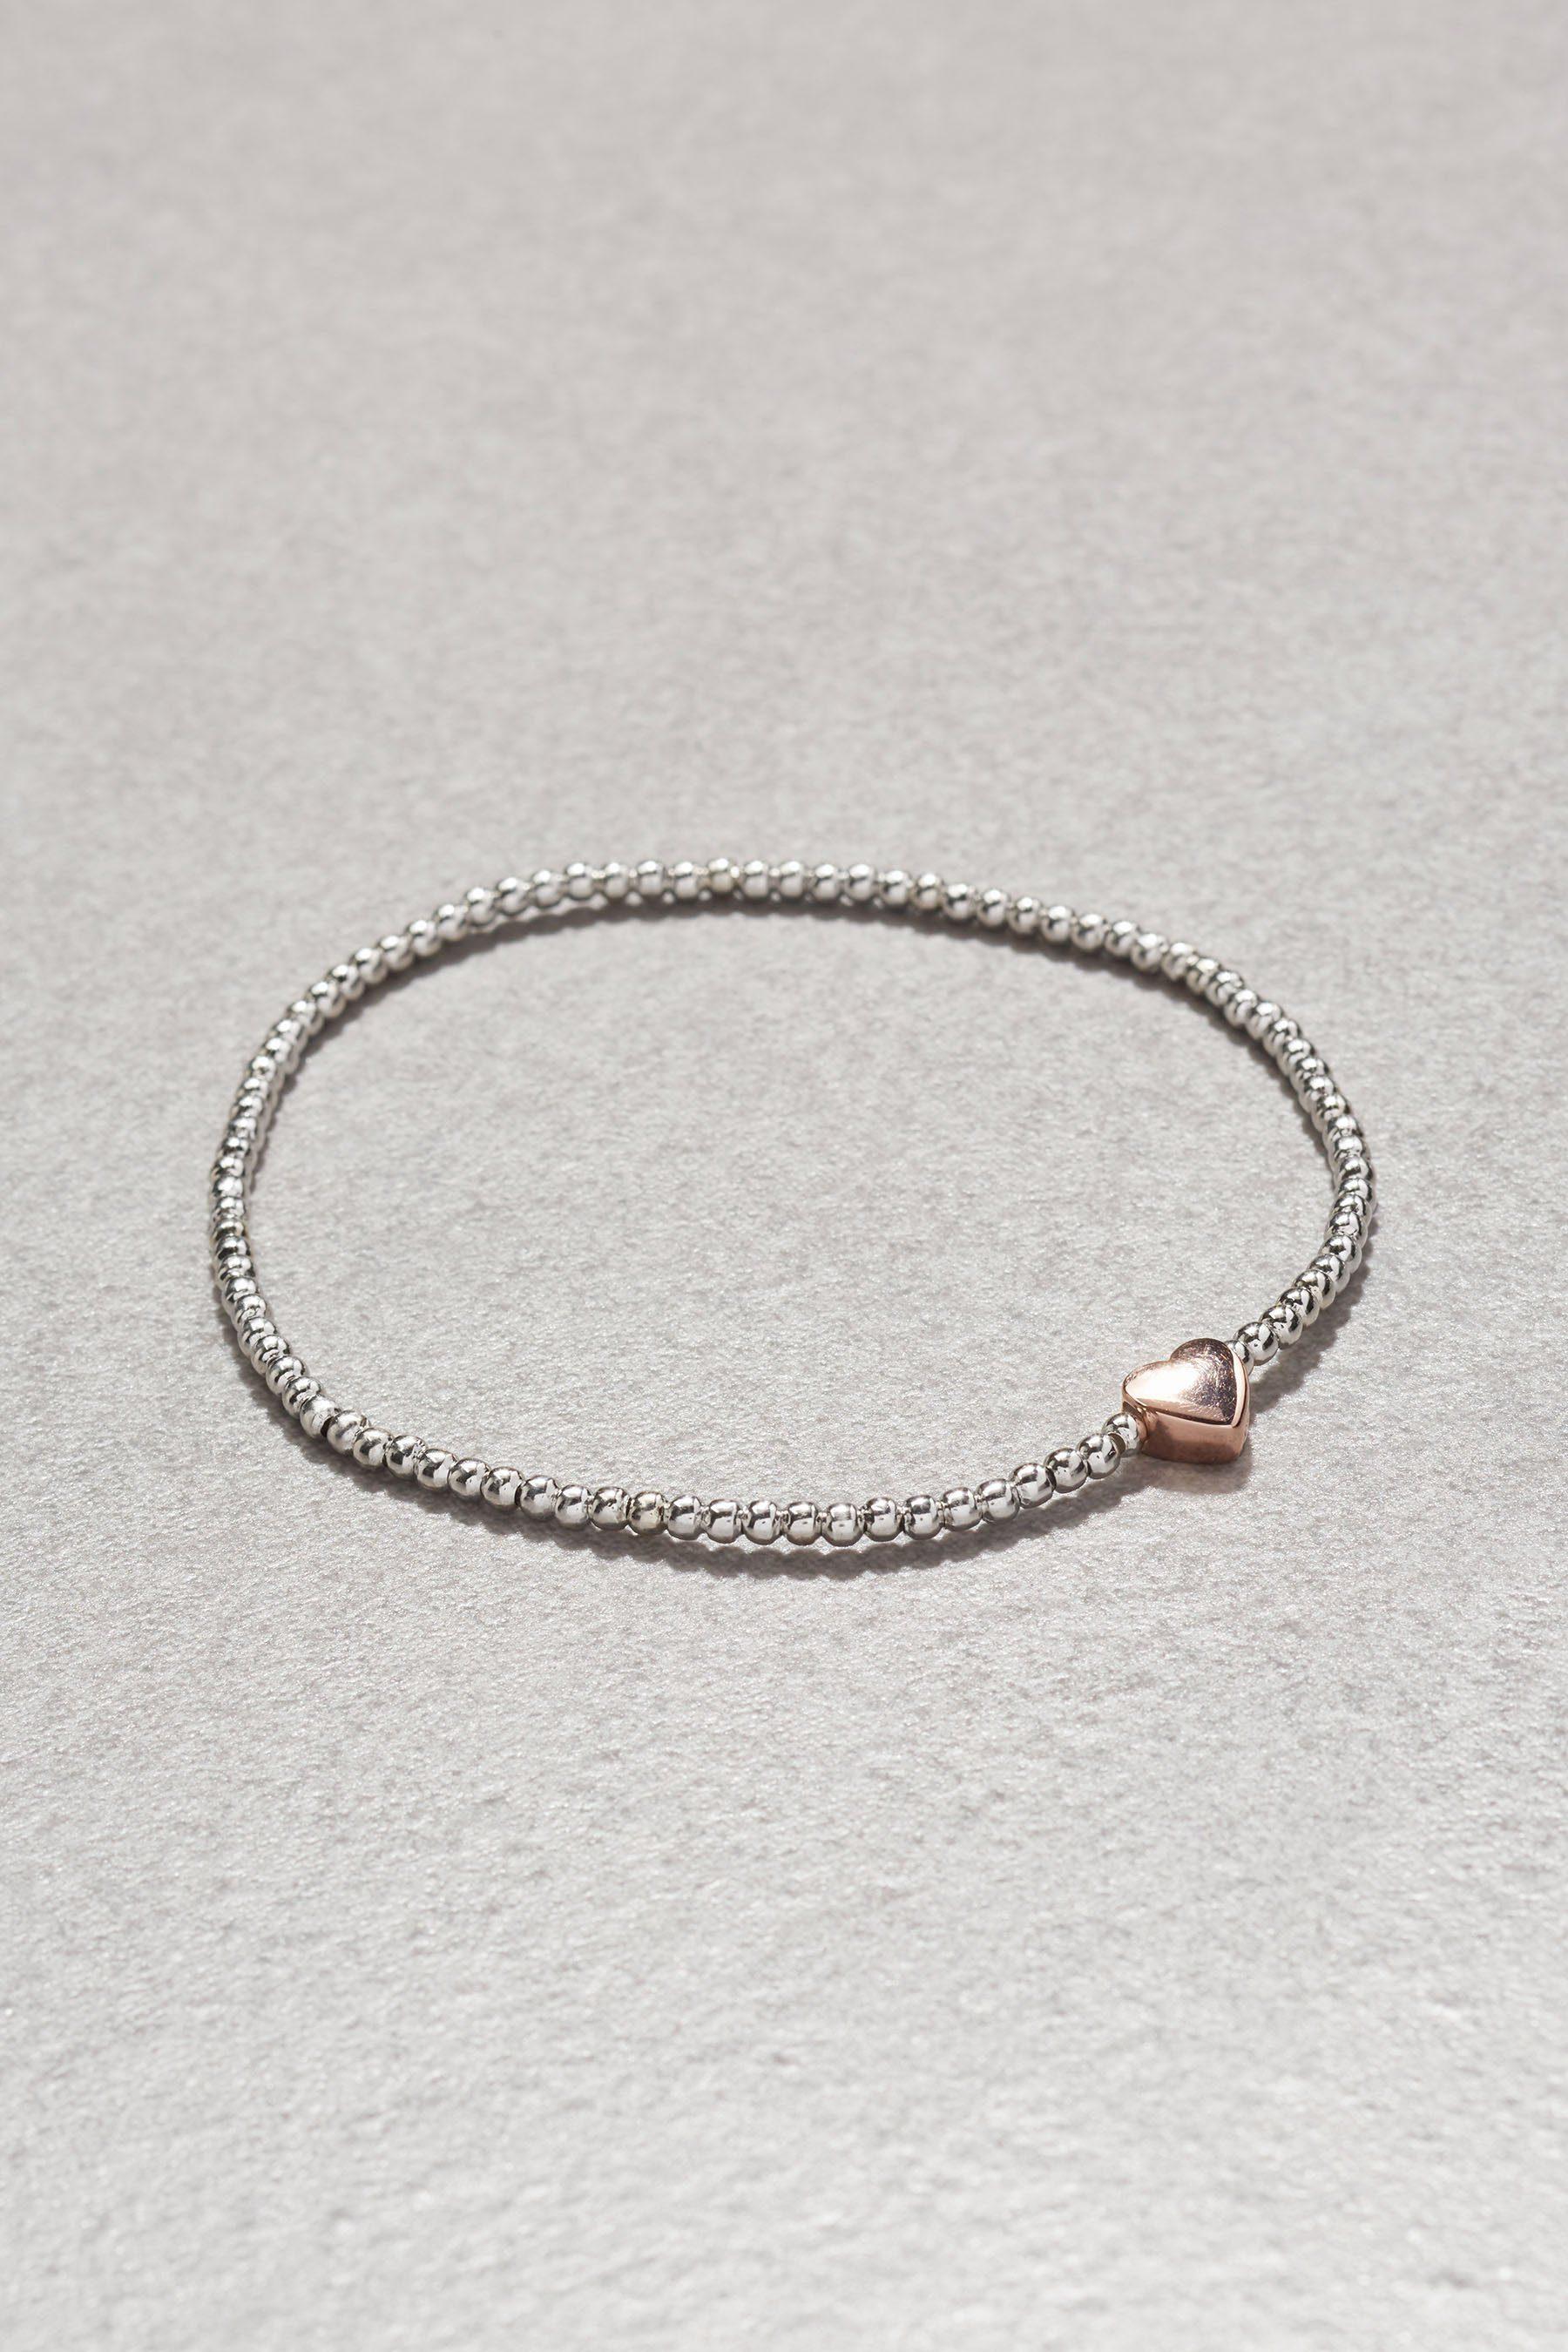 Next Armband in Perlenoptik mit Charm